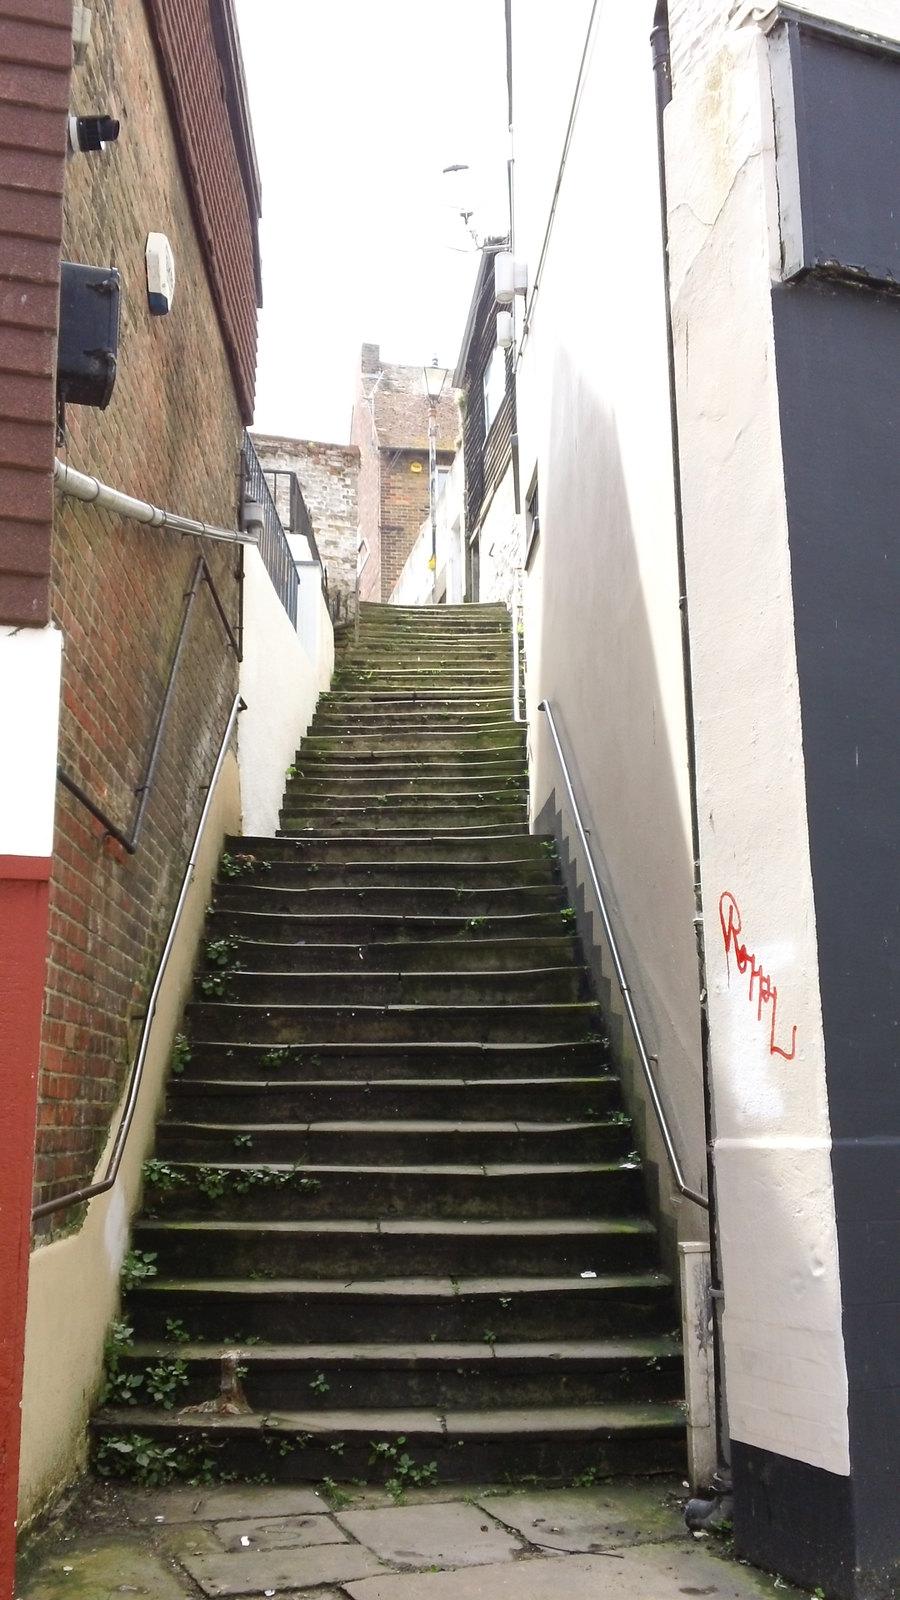 FOLKSTONE OLD TOWN ricketyoldfolkstonestairs